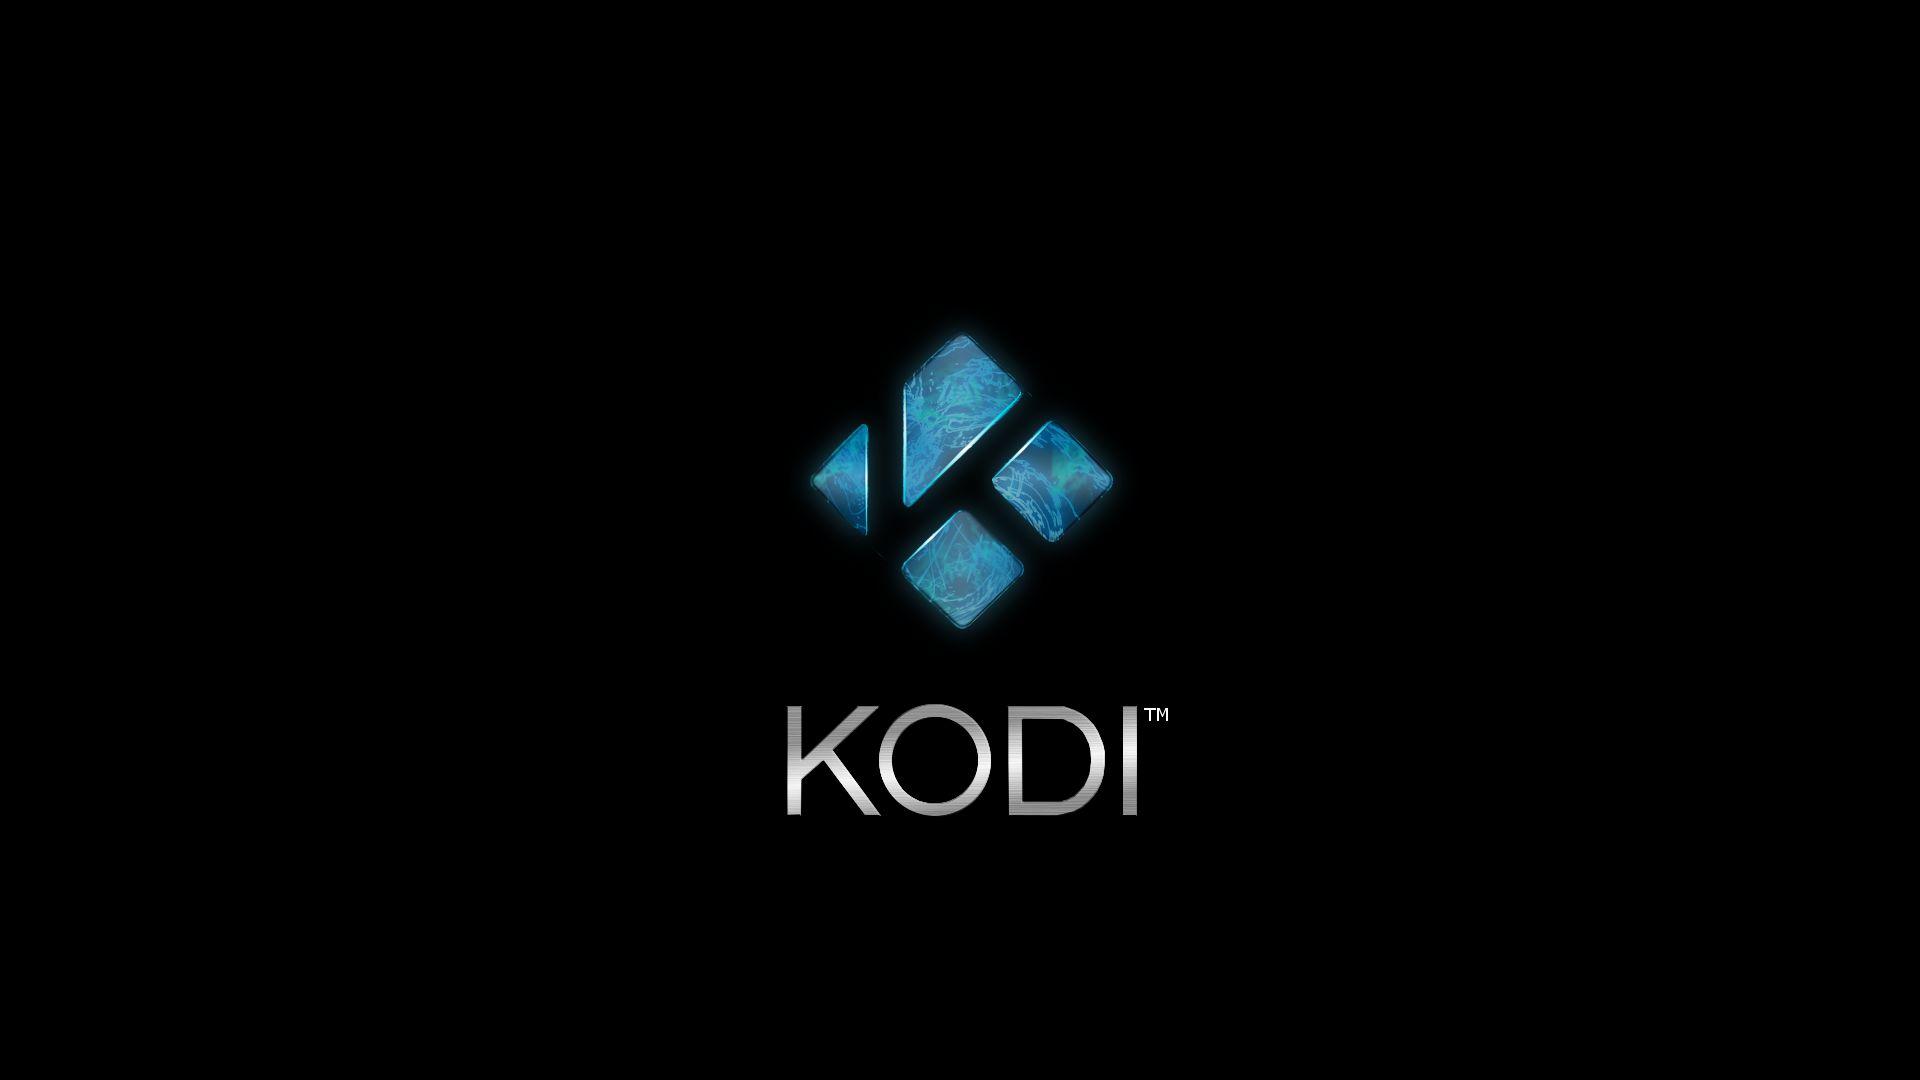 Kodi screen wallpaper